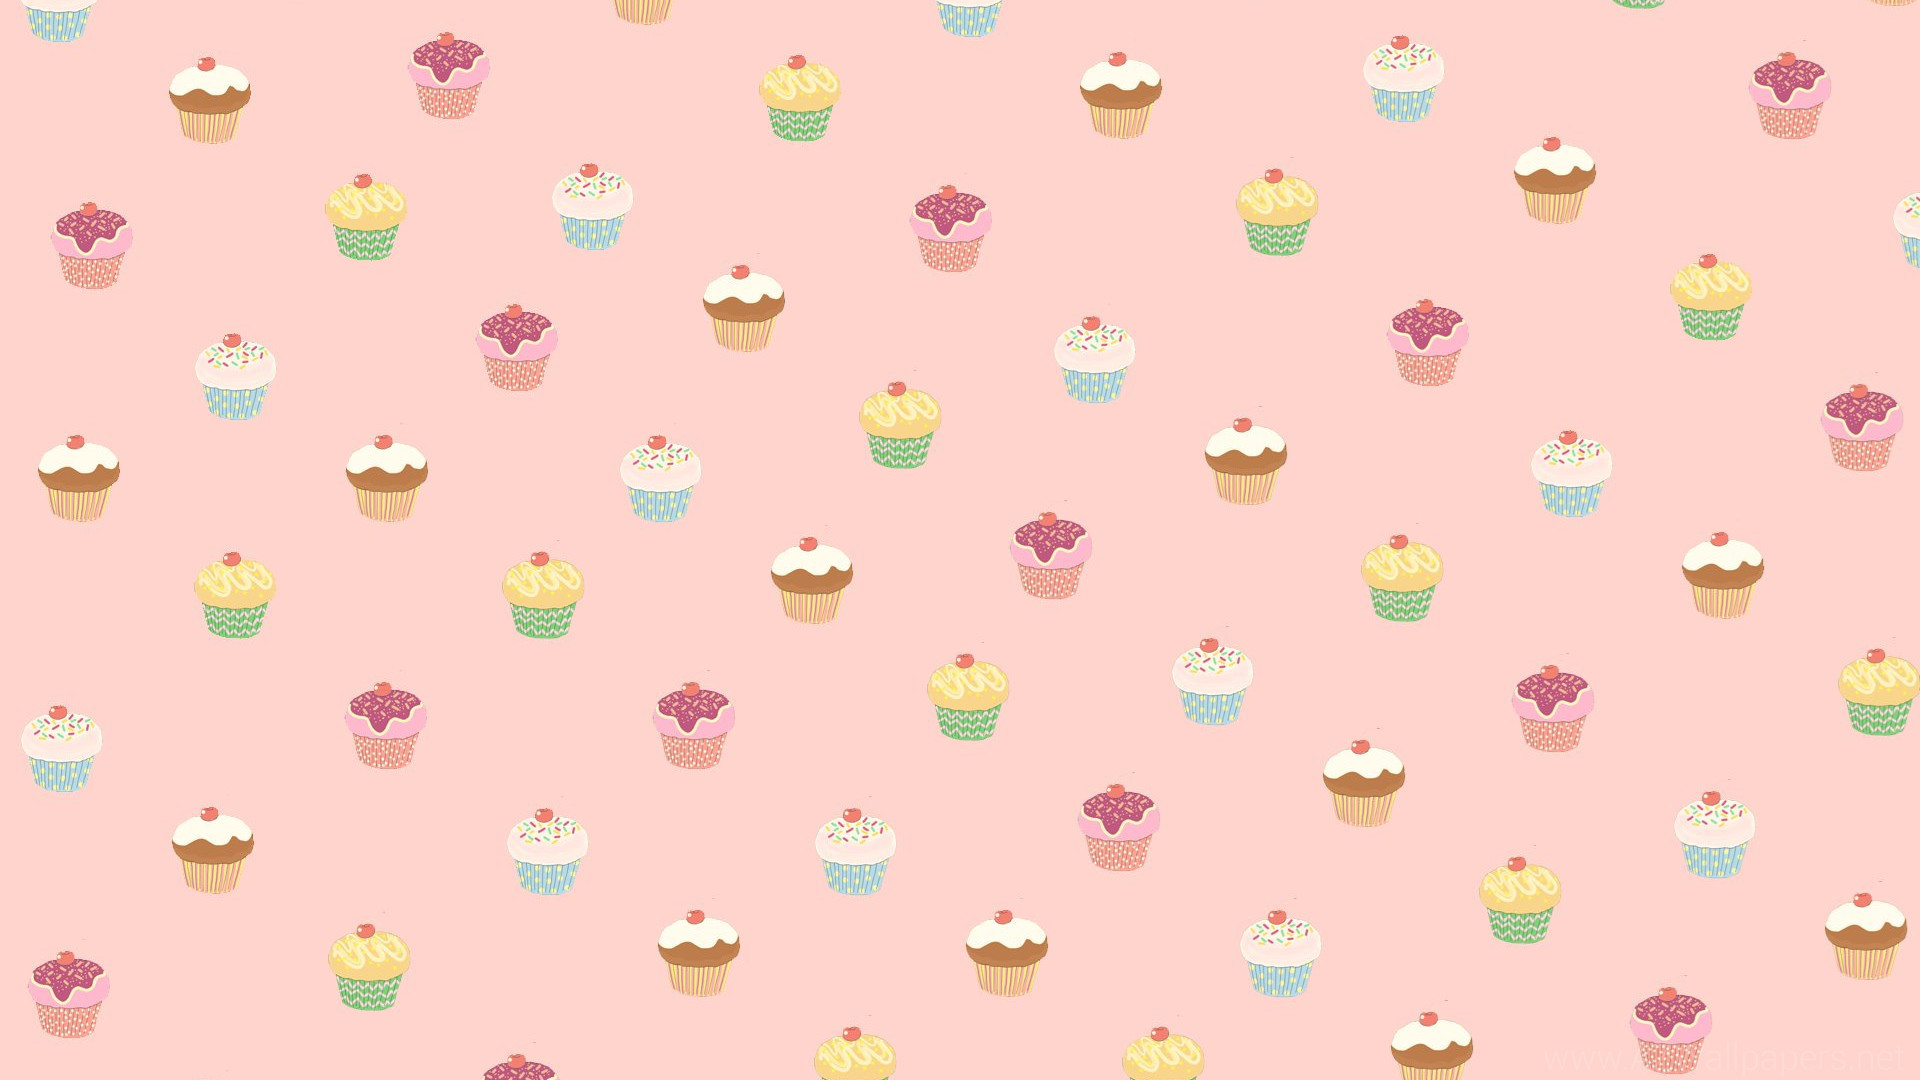 1920x1080 Cute Cupcake Wallpapers â'